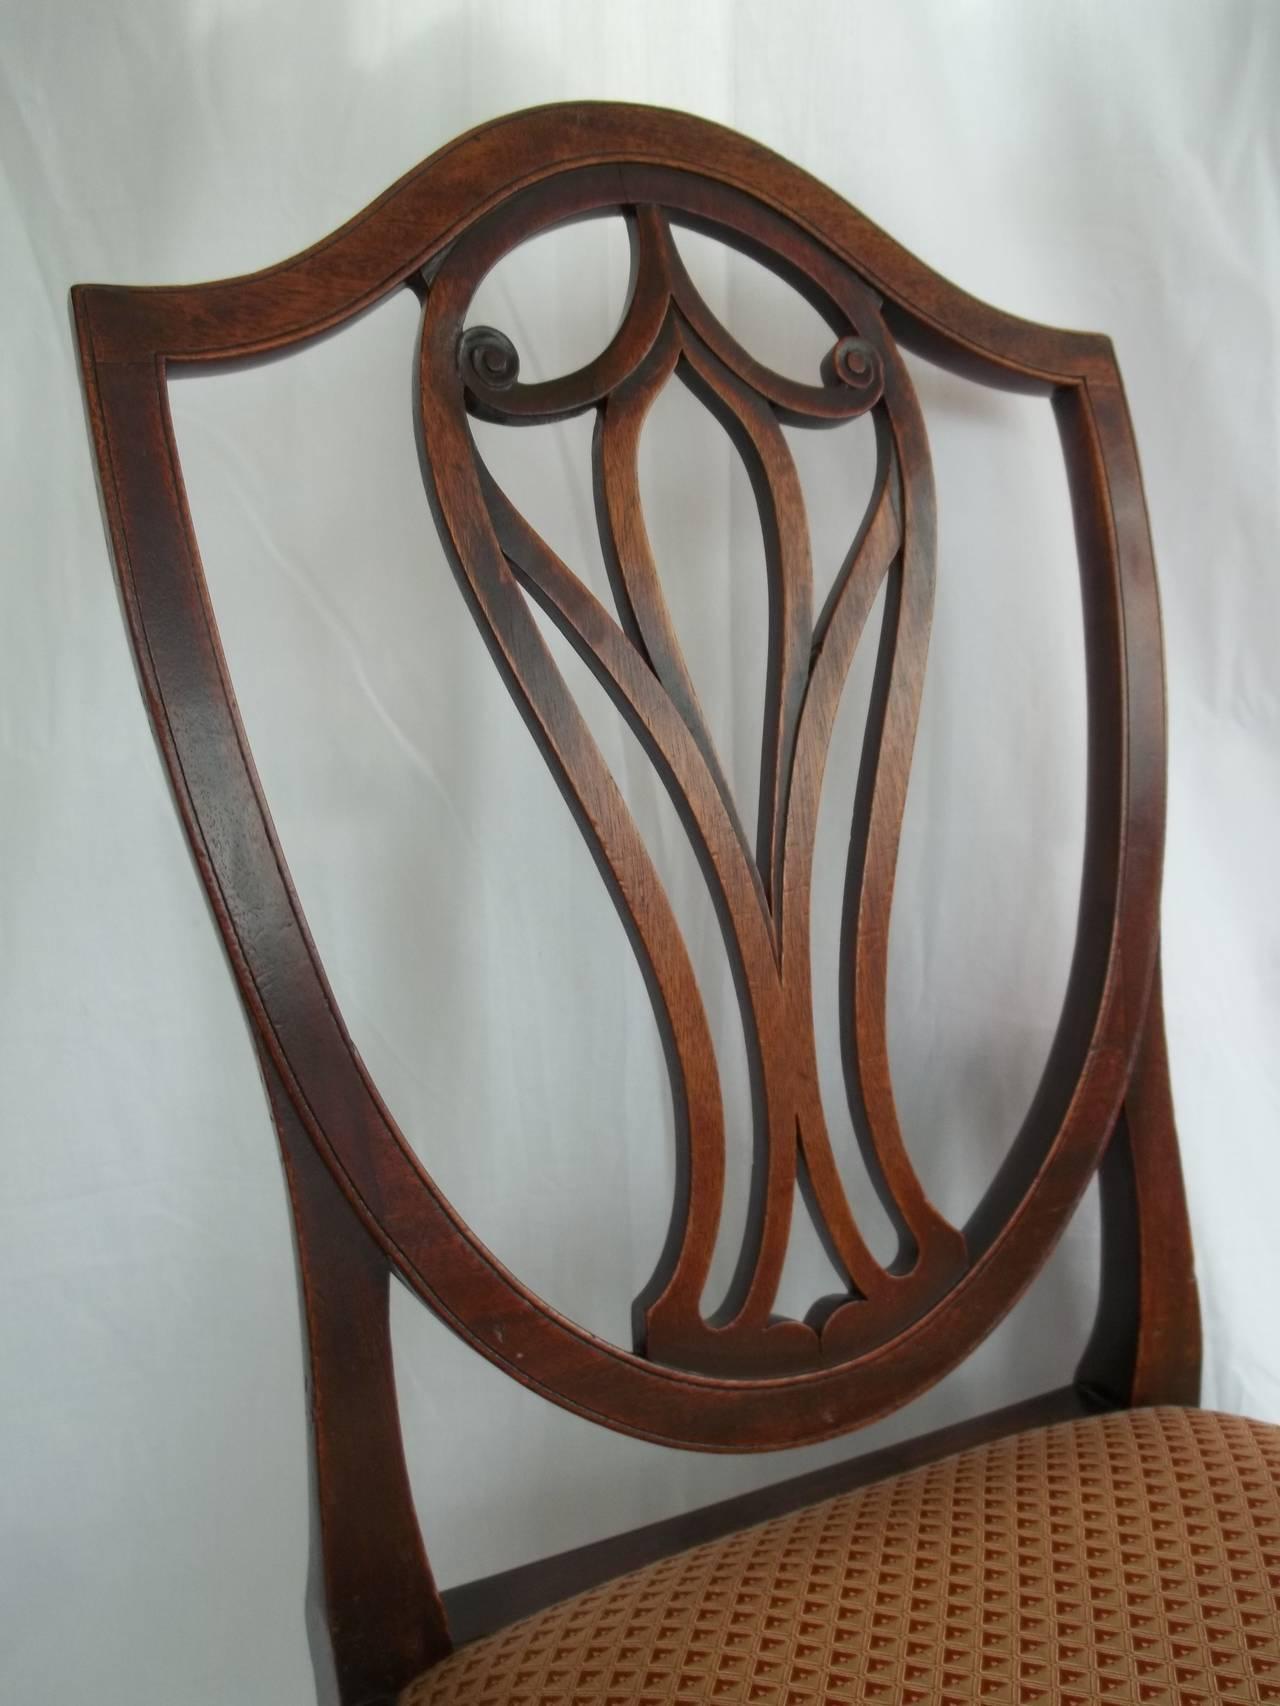 Elegant 18th Century Hepplewhite Side Chair in Mahogany, English circa 1785 For Sale 2